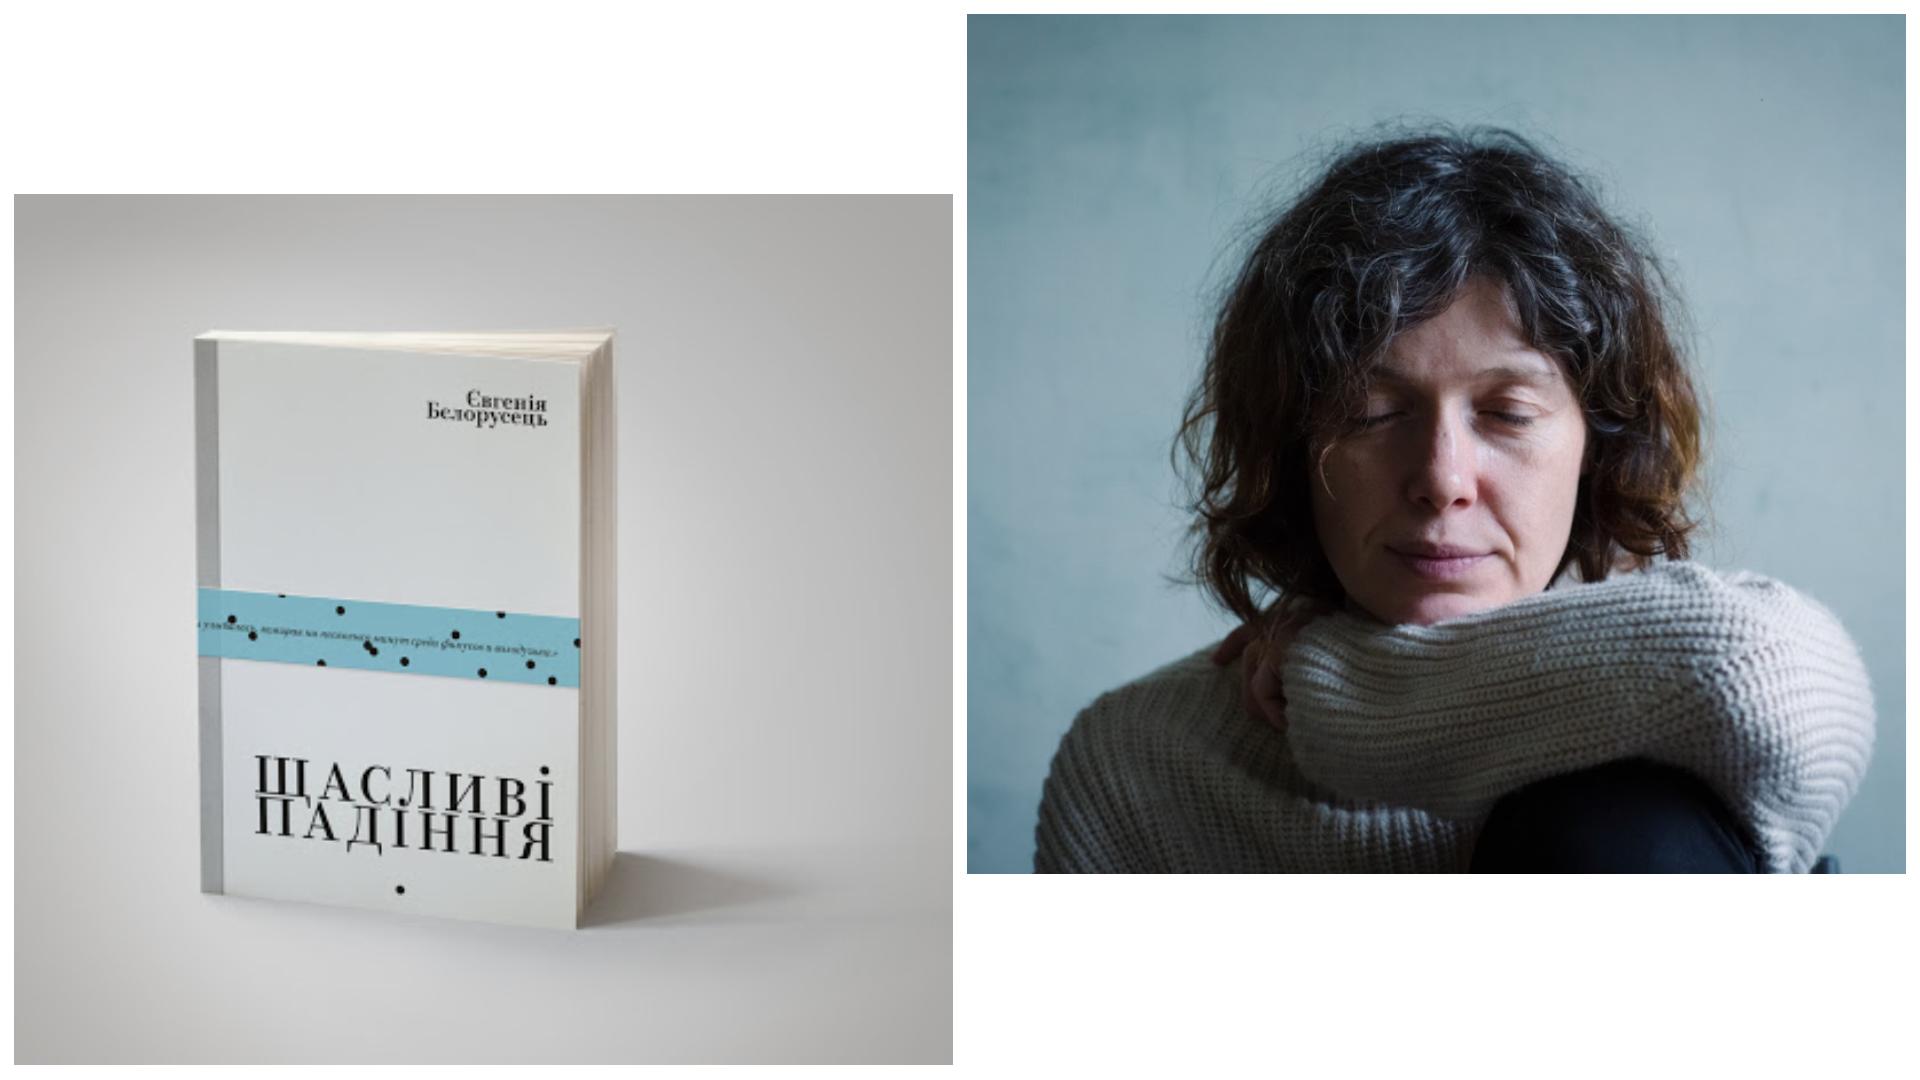 Книга Євгенії Бєлорусець отримала нагороду Internationaler Literaturpreis 2020